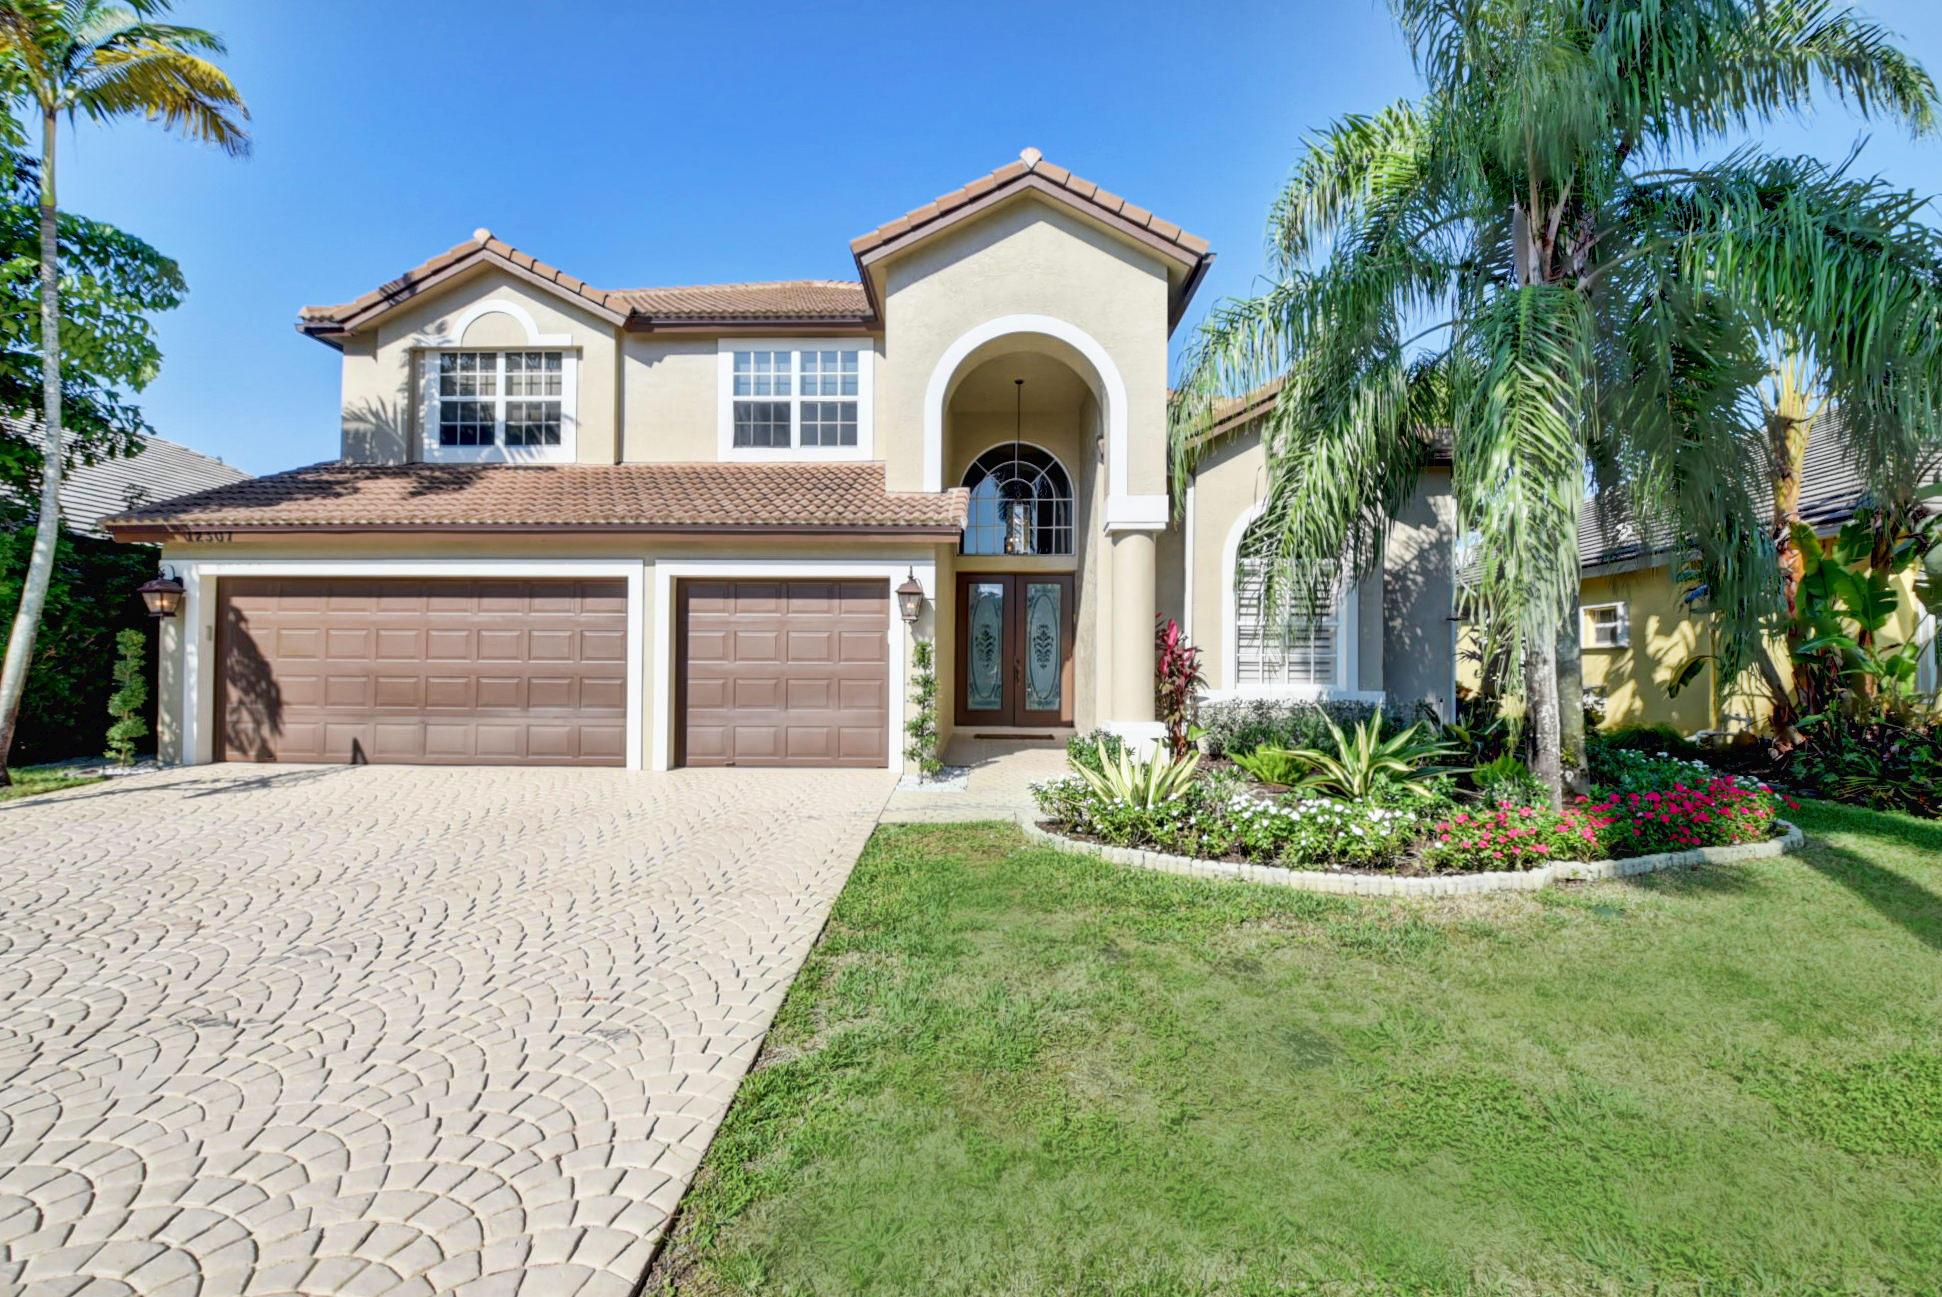 Photo of 12307 Cascades Pointe Drive, Boca Raton, FL 33428